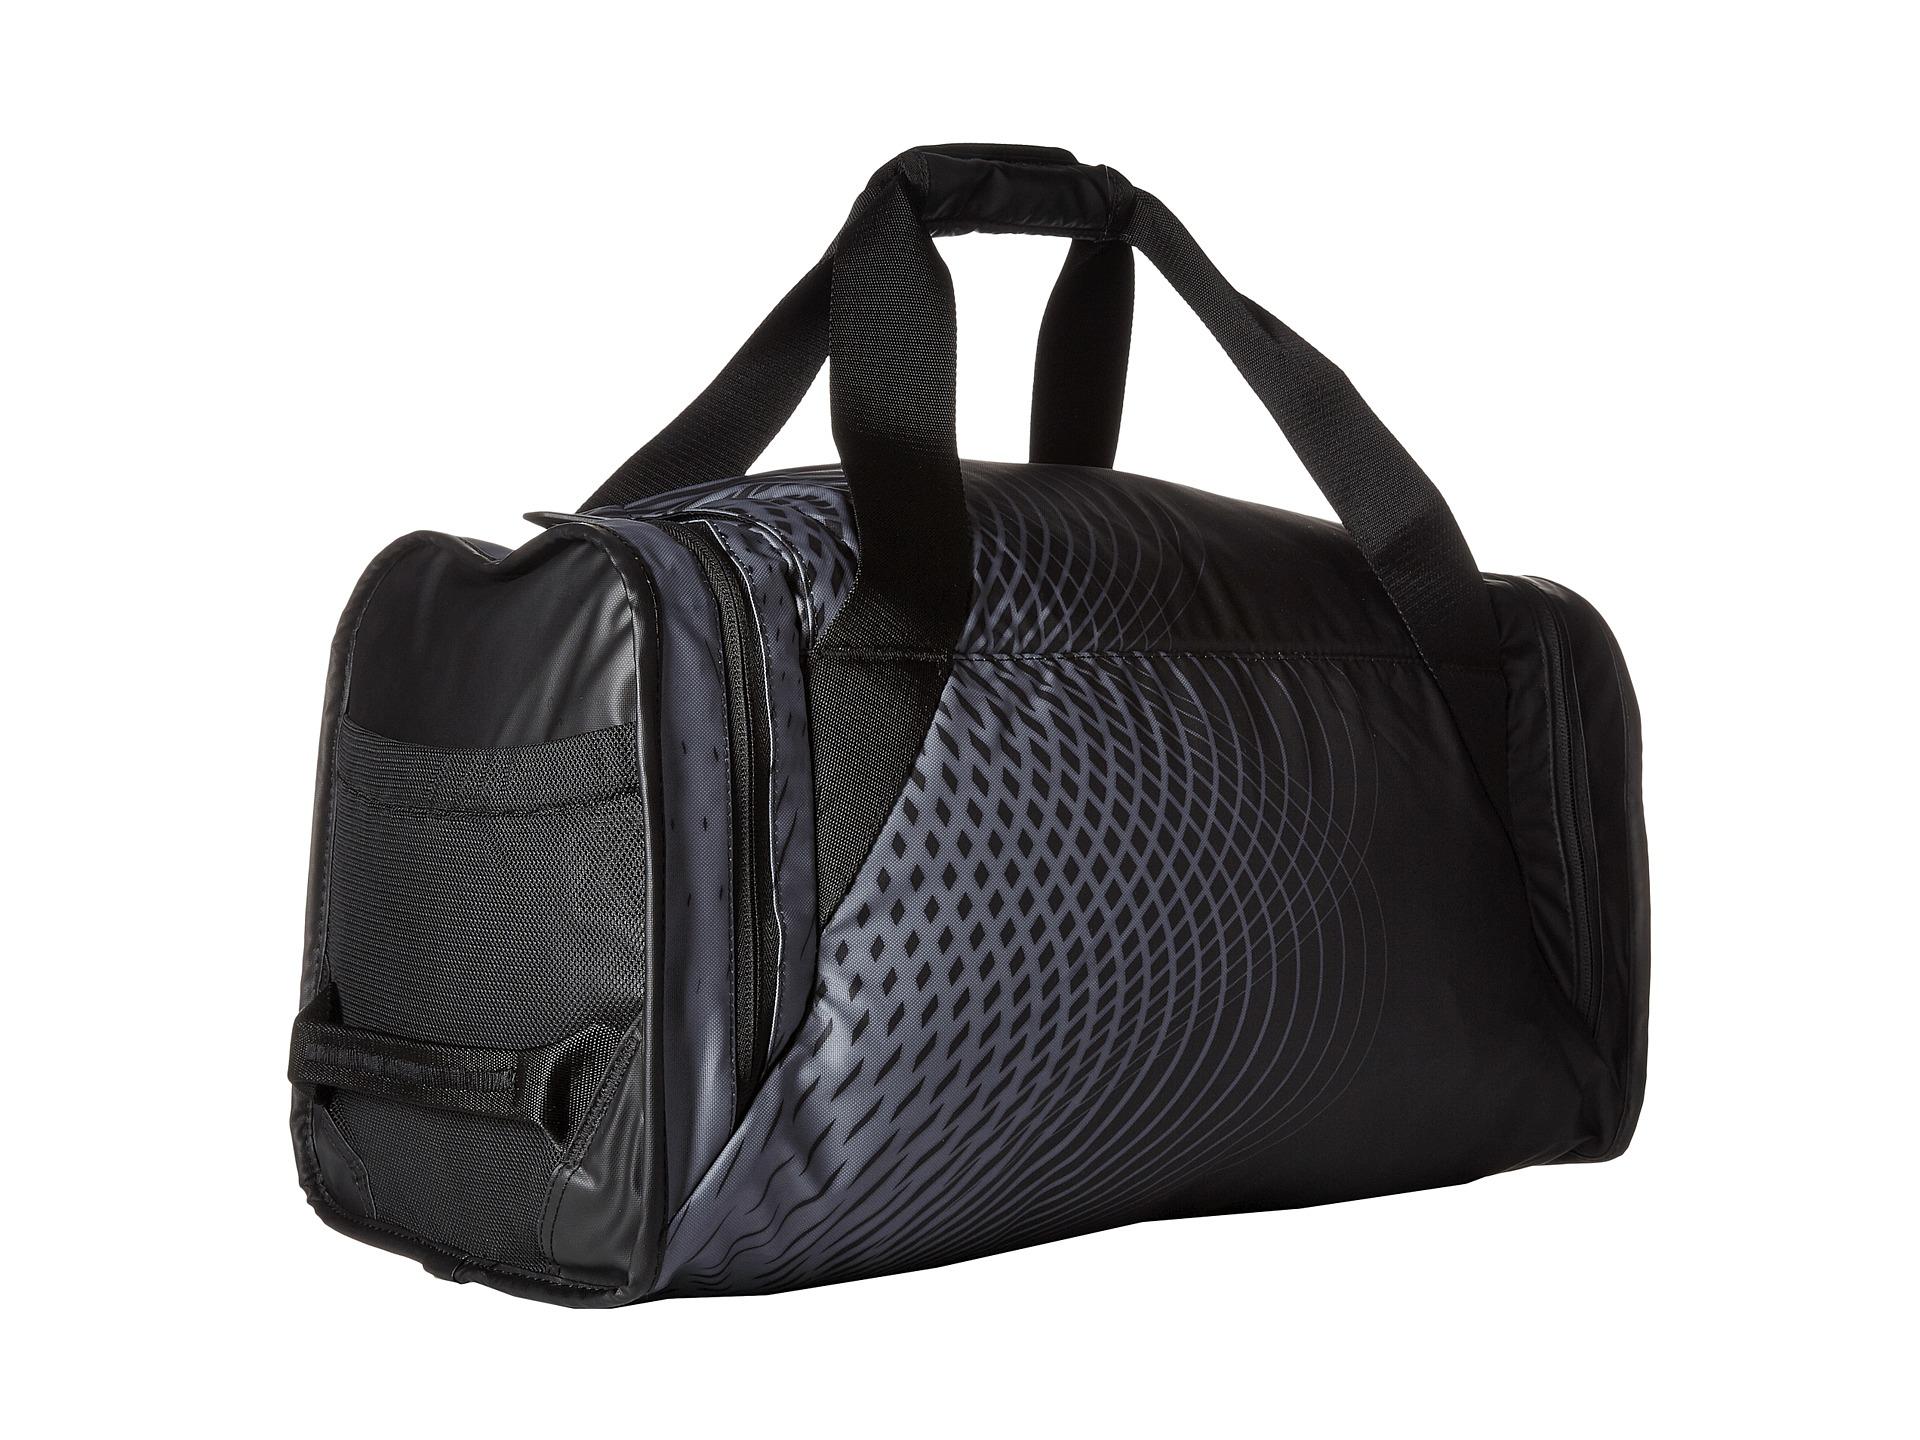 Lyst - Nike Ultimatum Small Duffel - Graphic in Black for Men 98e94a416c1dd